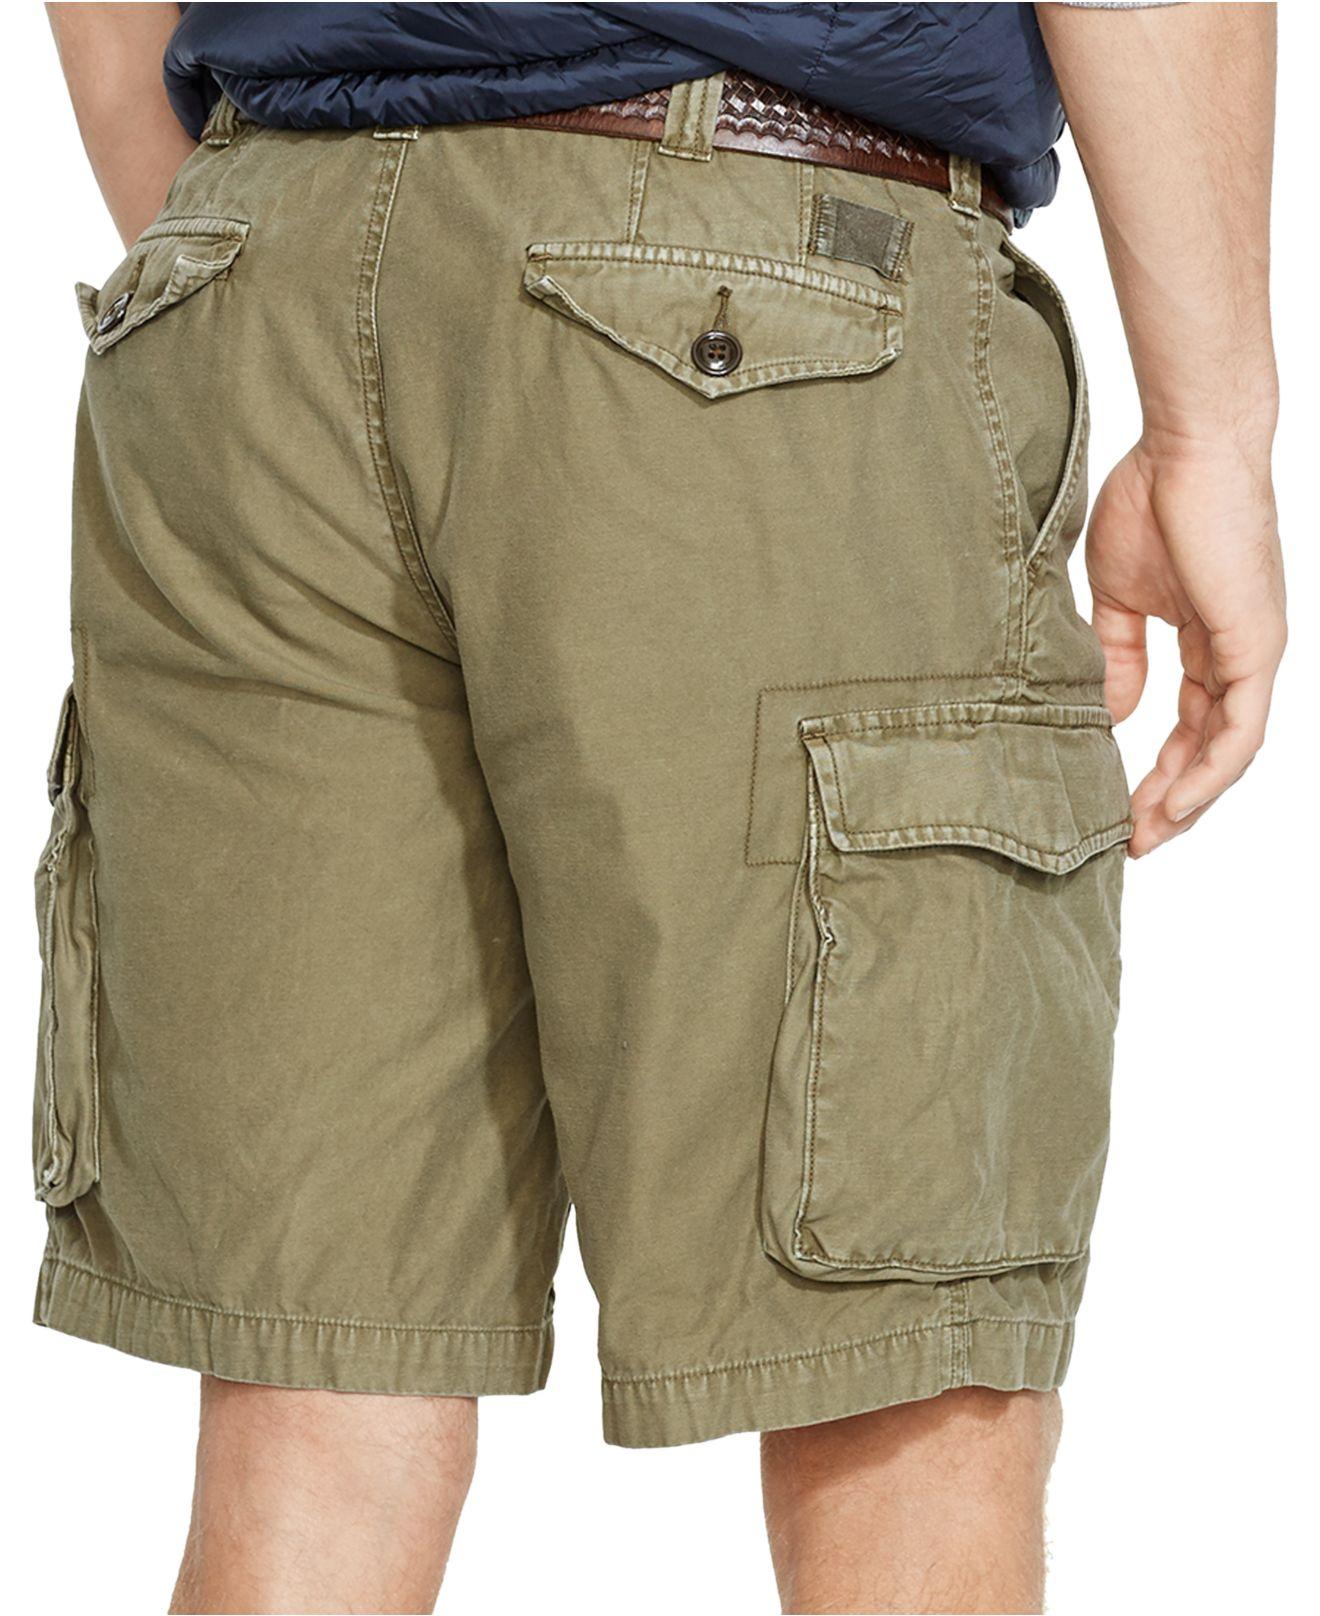 a3b0f00aa7 ... aliexpress lyst polo ralph lauren classic fit commander cargo shorts in  green d0186 08698